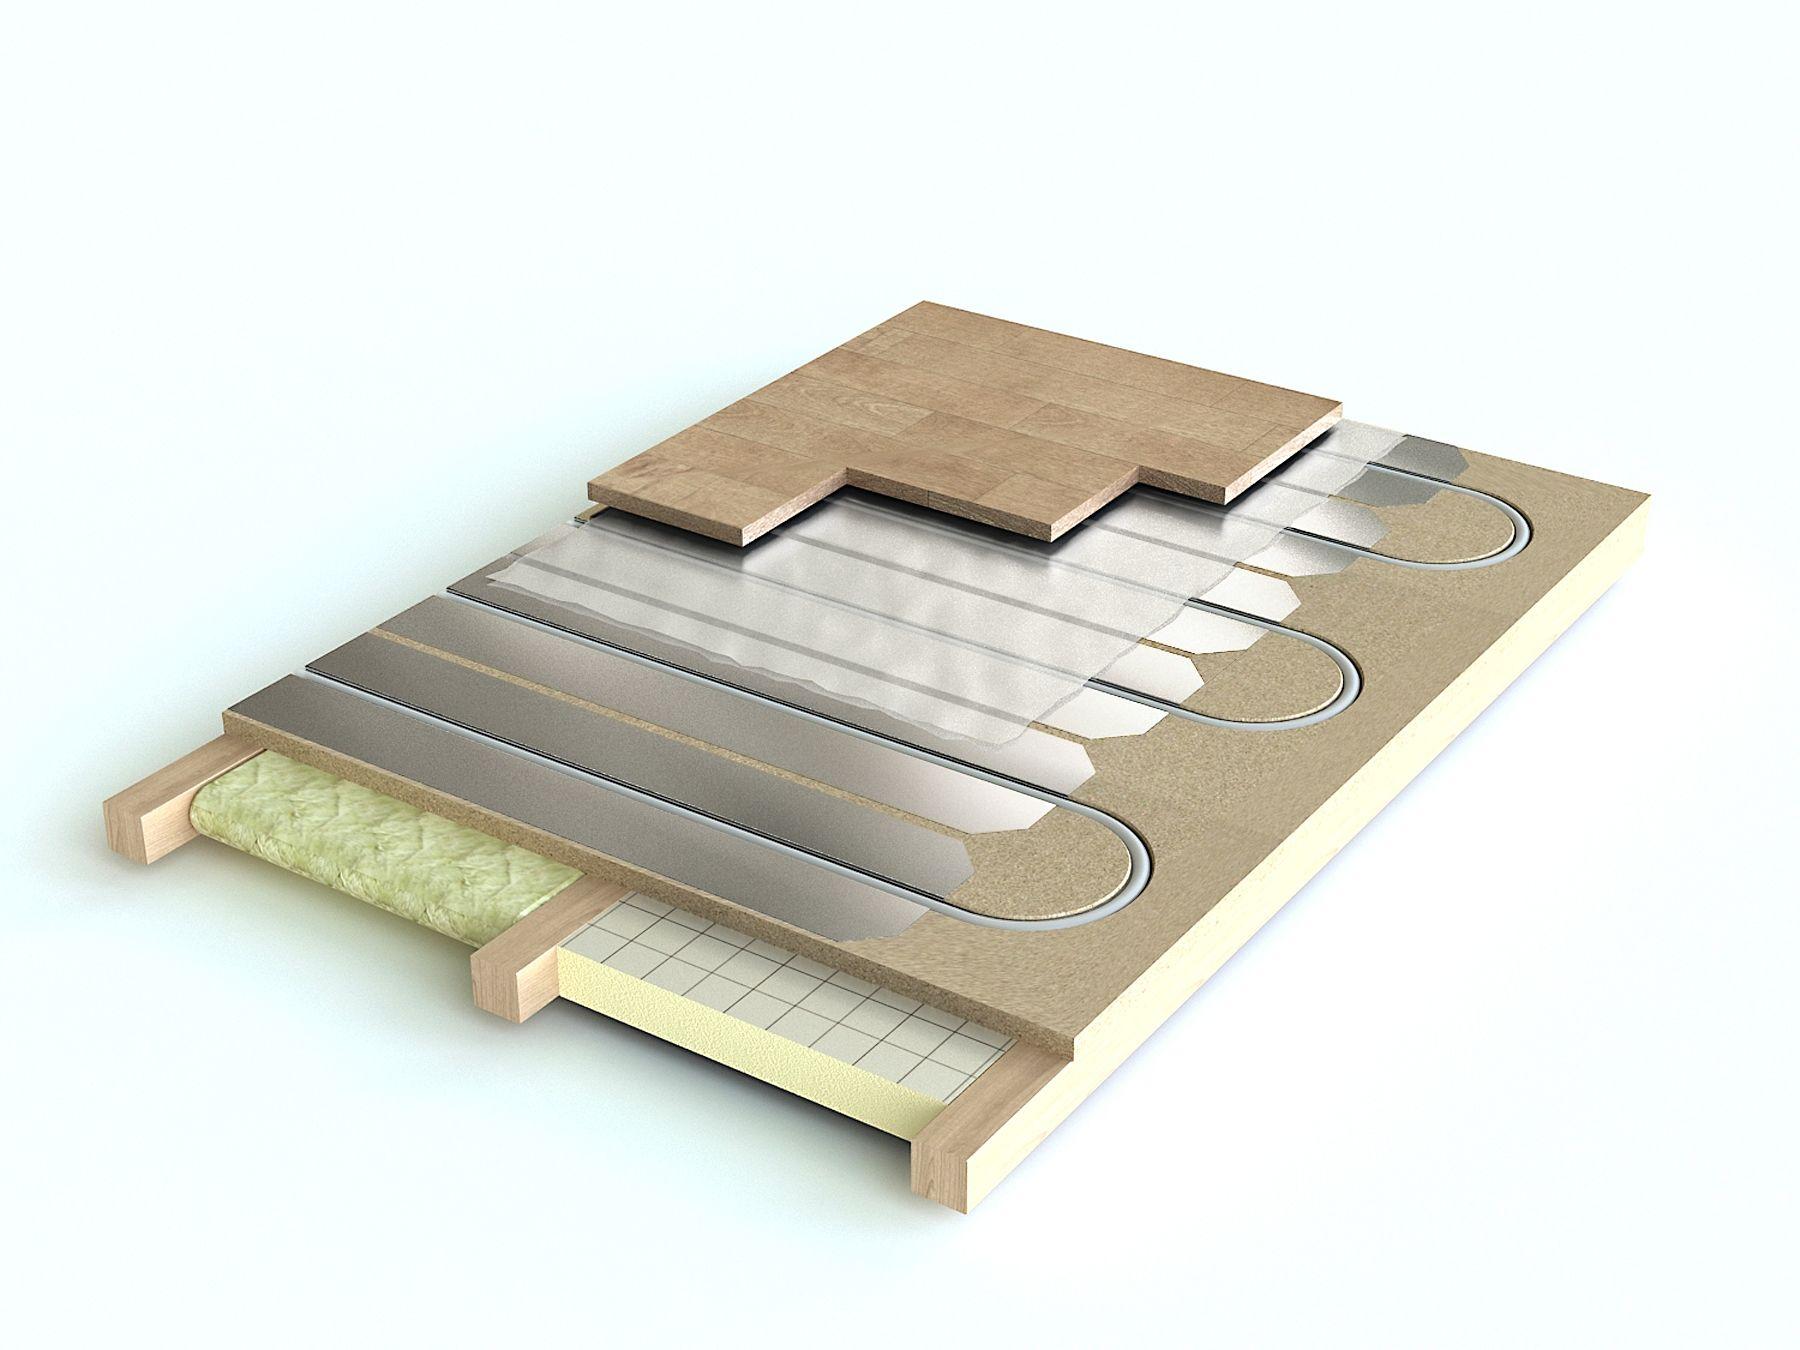 Wood floor underfloor heating systems httpdreamhomesbyrob wood floor underfloor heating systems dailygadgetfo Choice Image